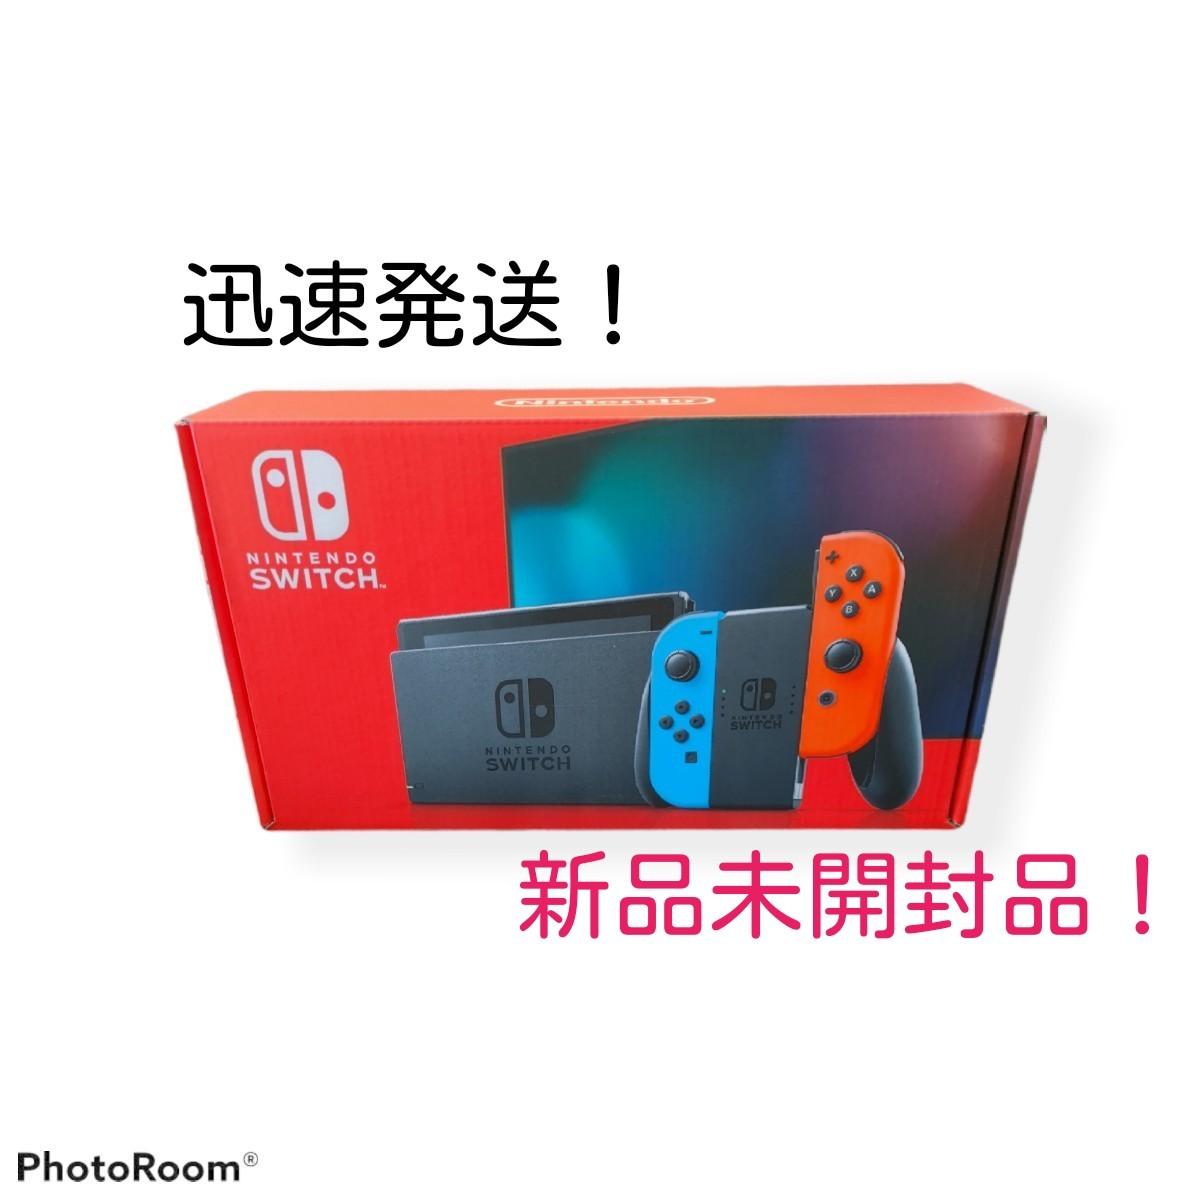 Nintendo Switch 任天堂スイッチ 本体 新品 新型 ネオン レッドブルー 本体